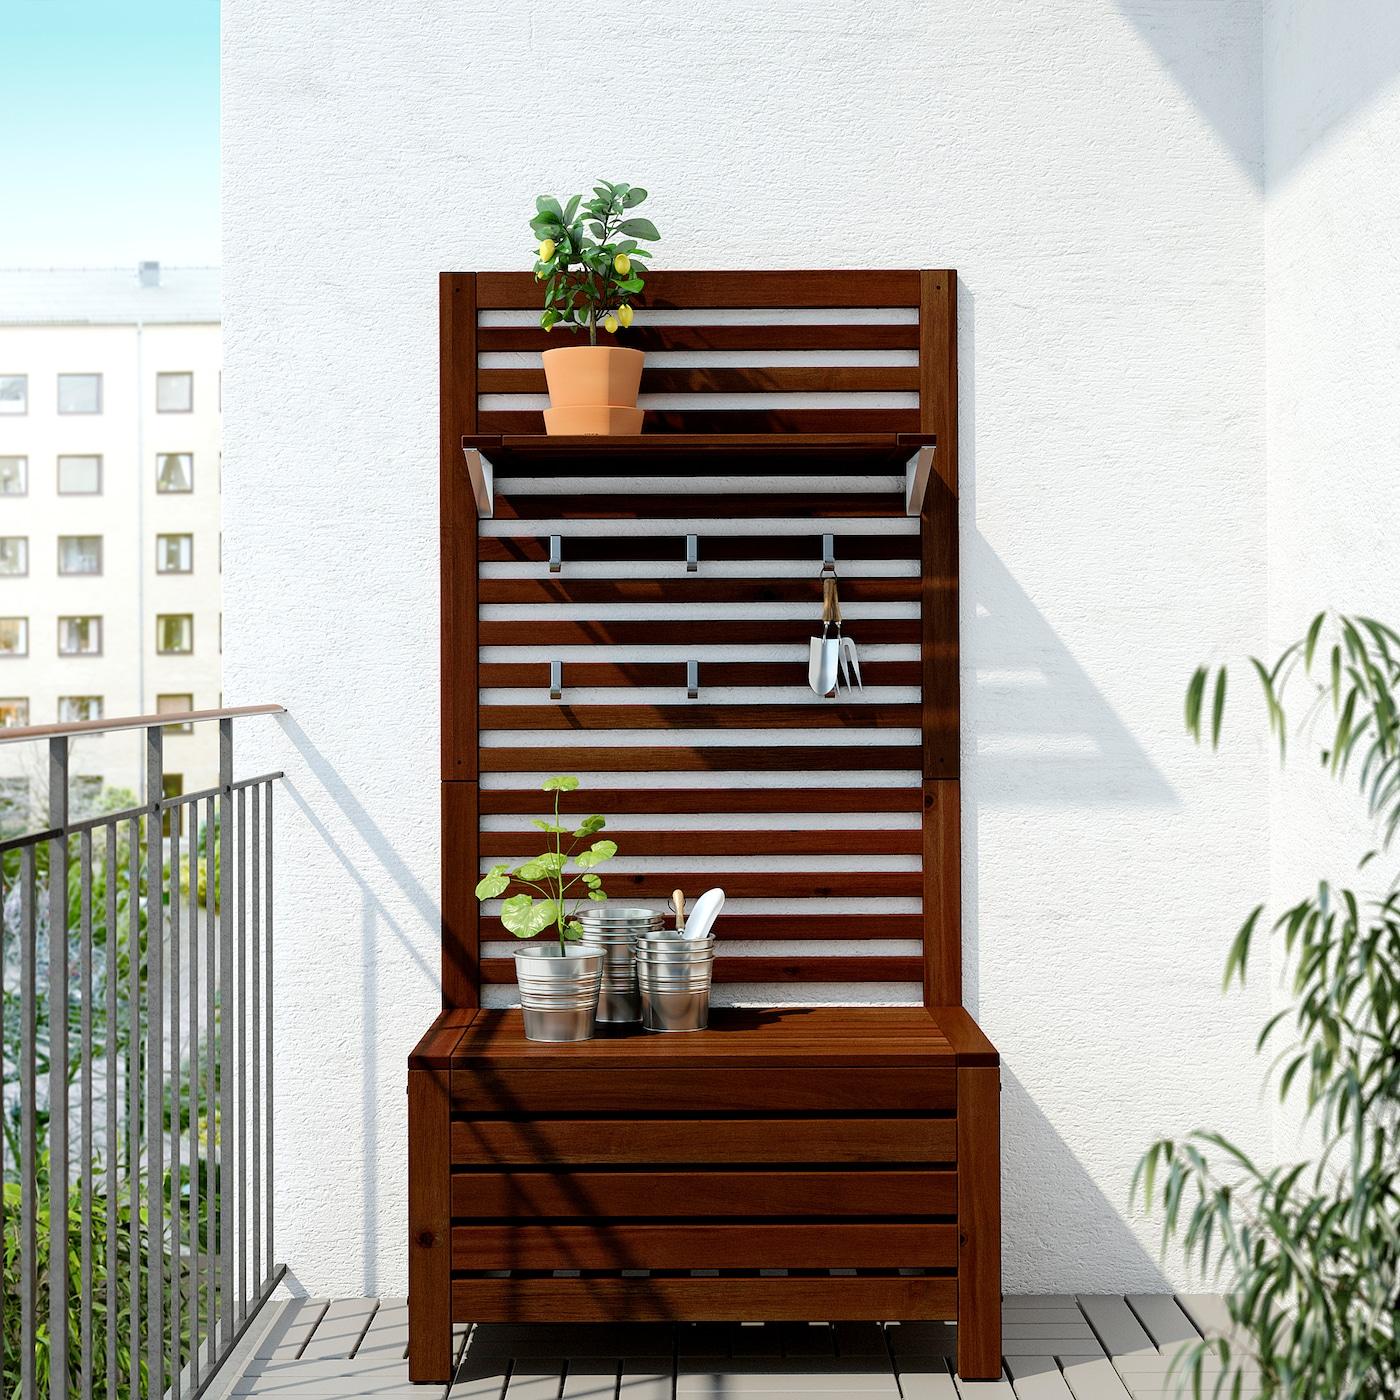 ÄPPLARÖ Bench w wall panel+ shelf, outdoor - brown stained 7x7x7 cm